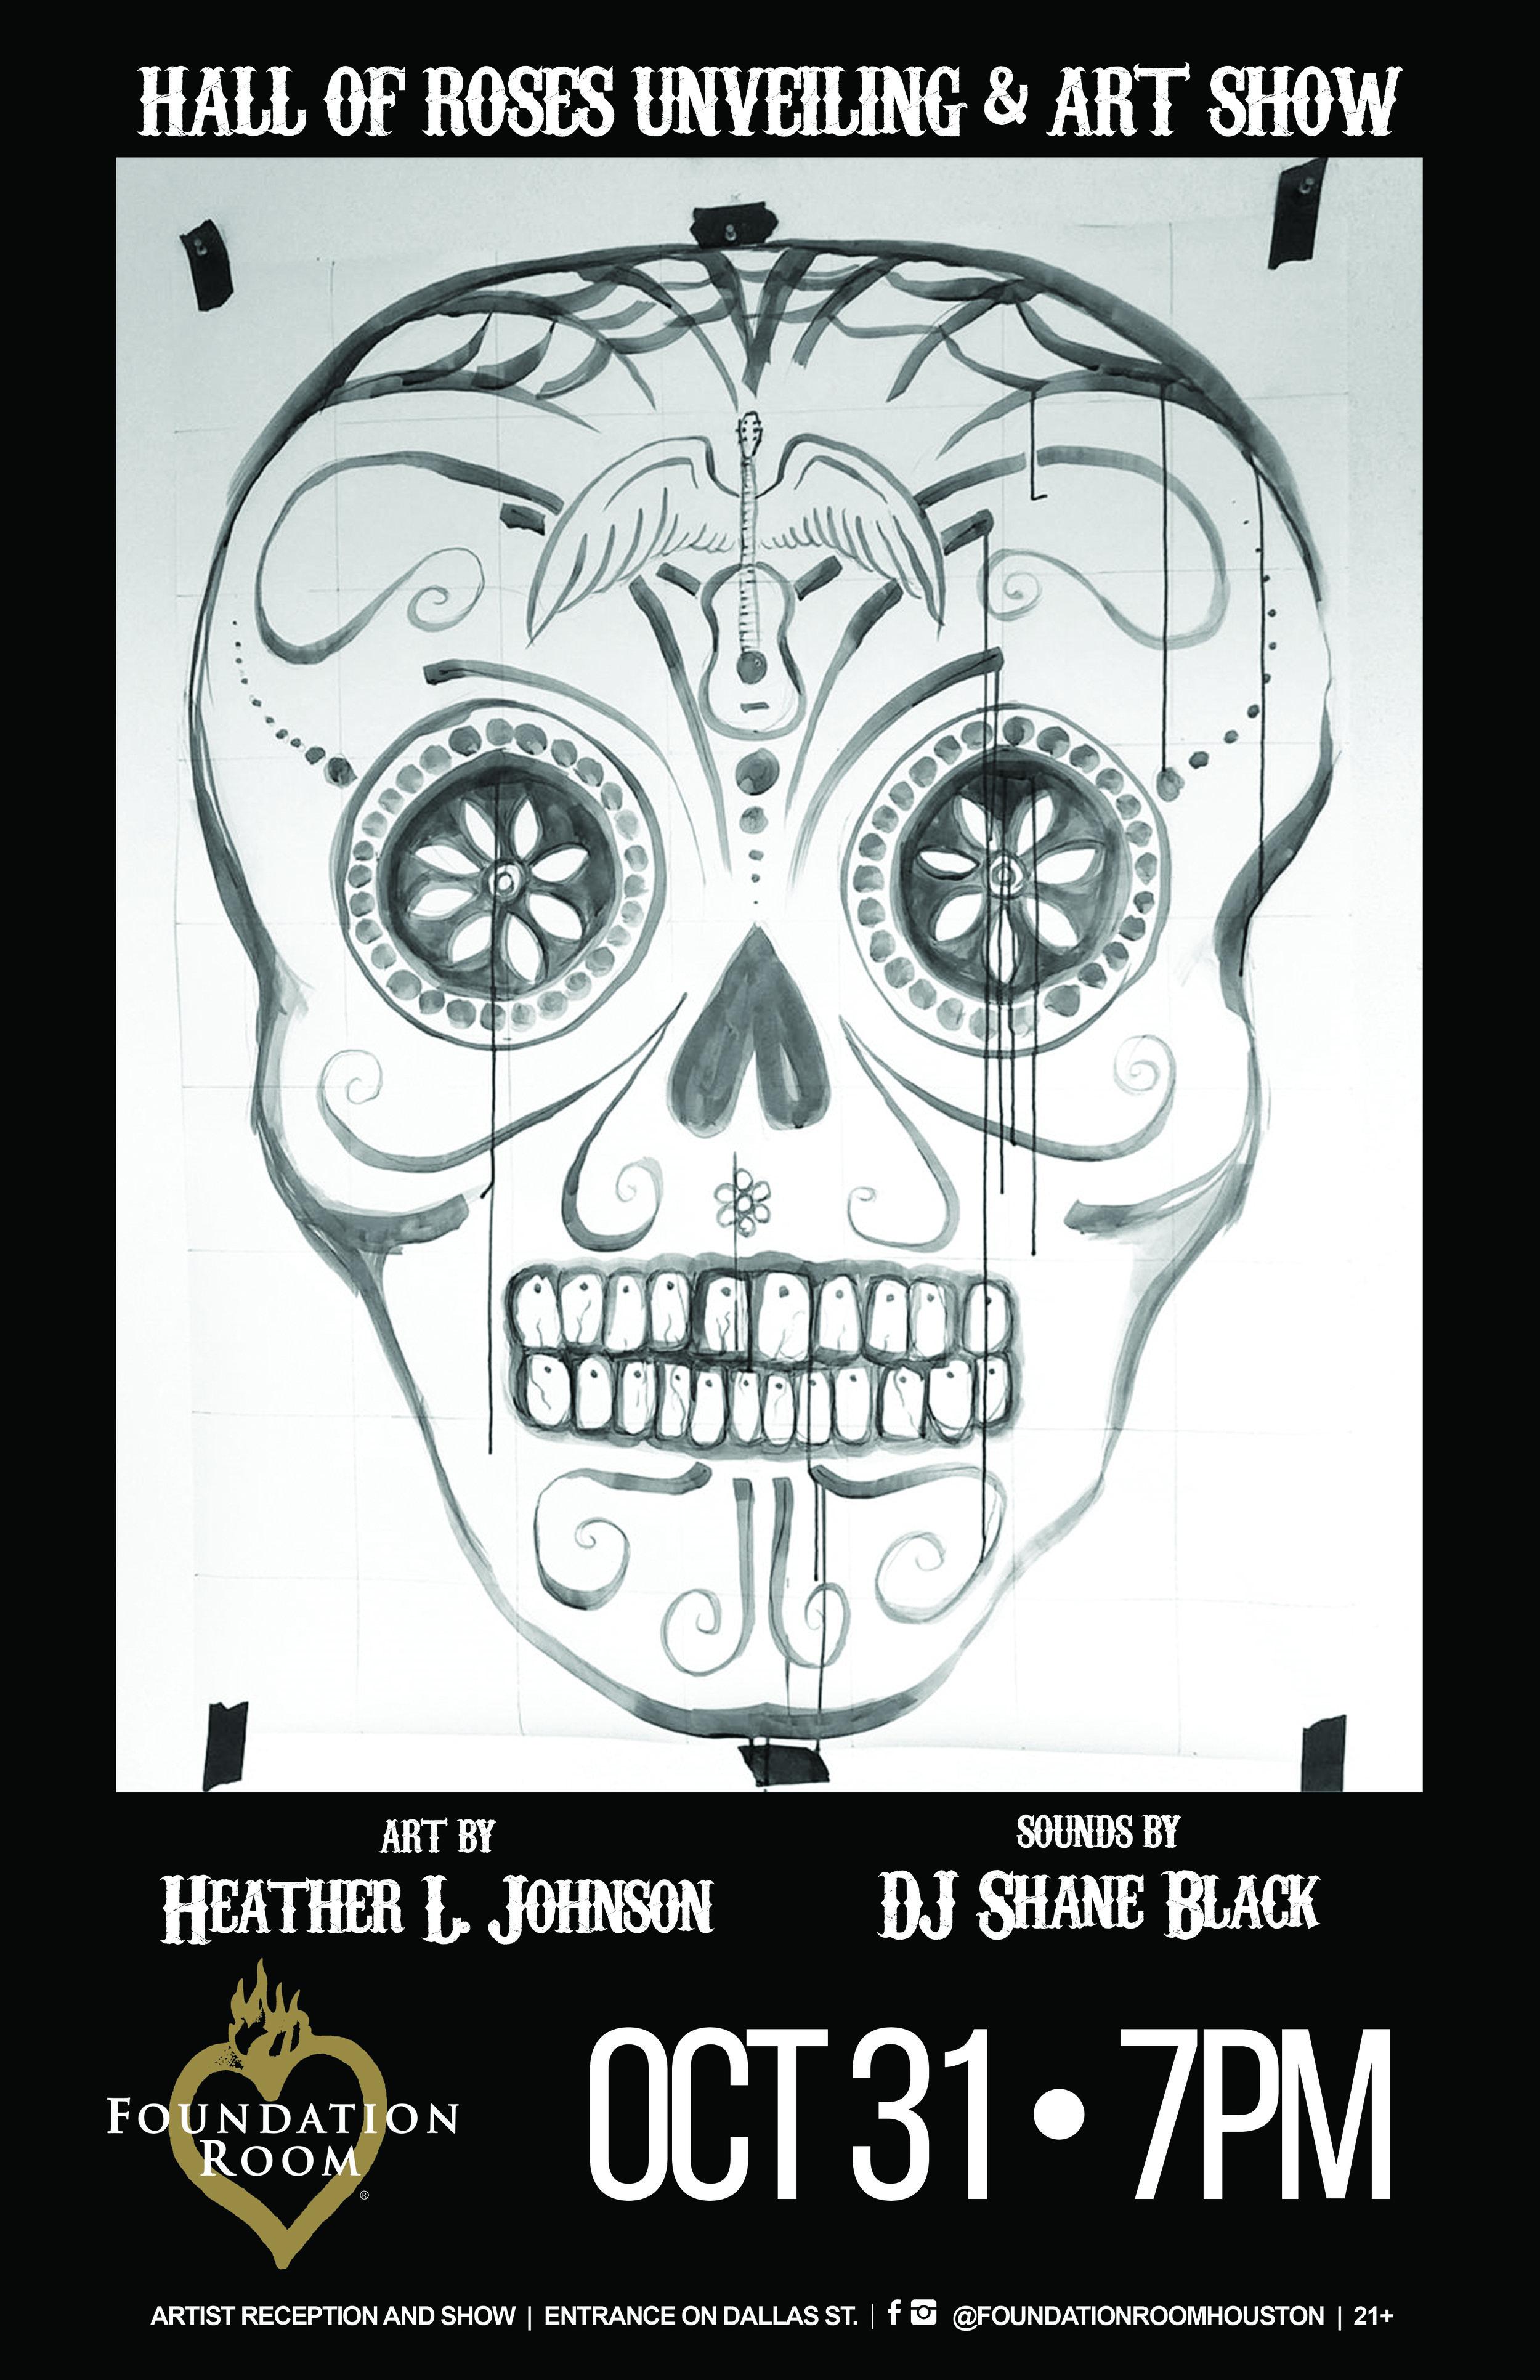 HallofRoses-promo-poster_11x17.jpg